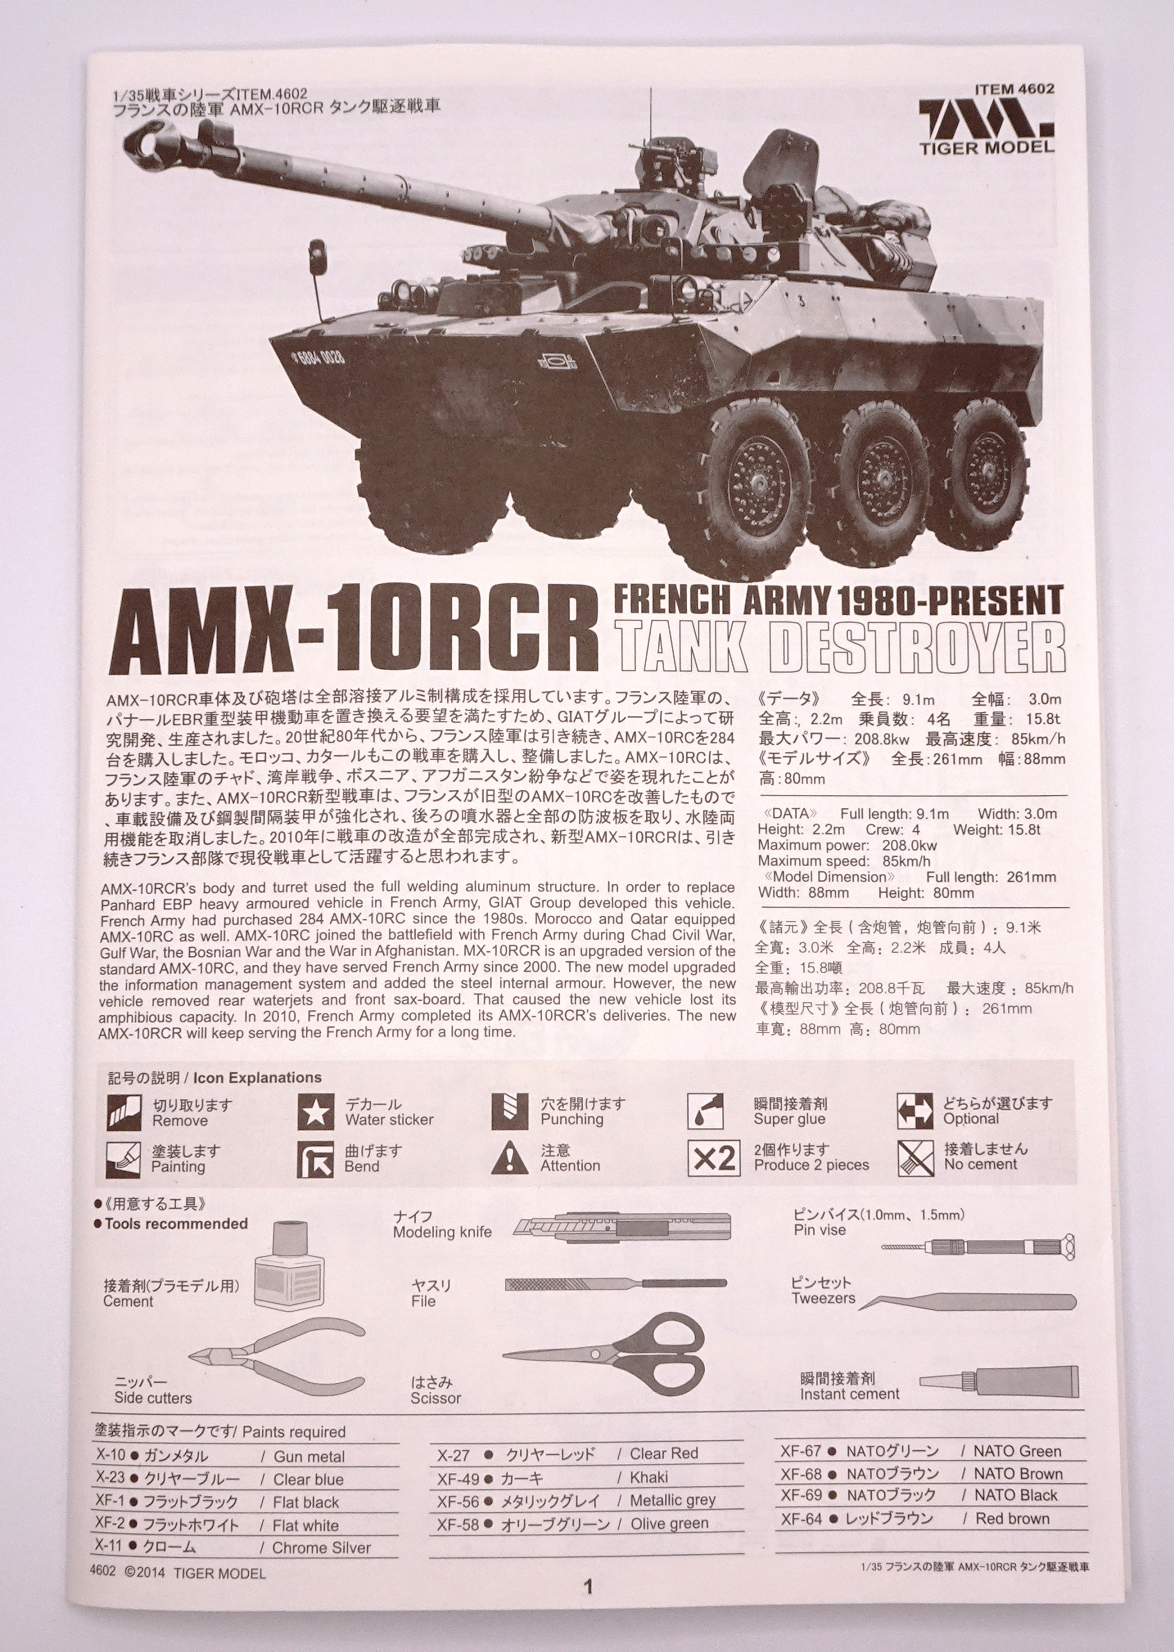 [Tiger Model] AMX-10RCR réf. 4602 - 1/35 Amx10-plan-1